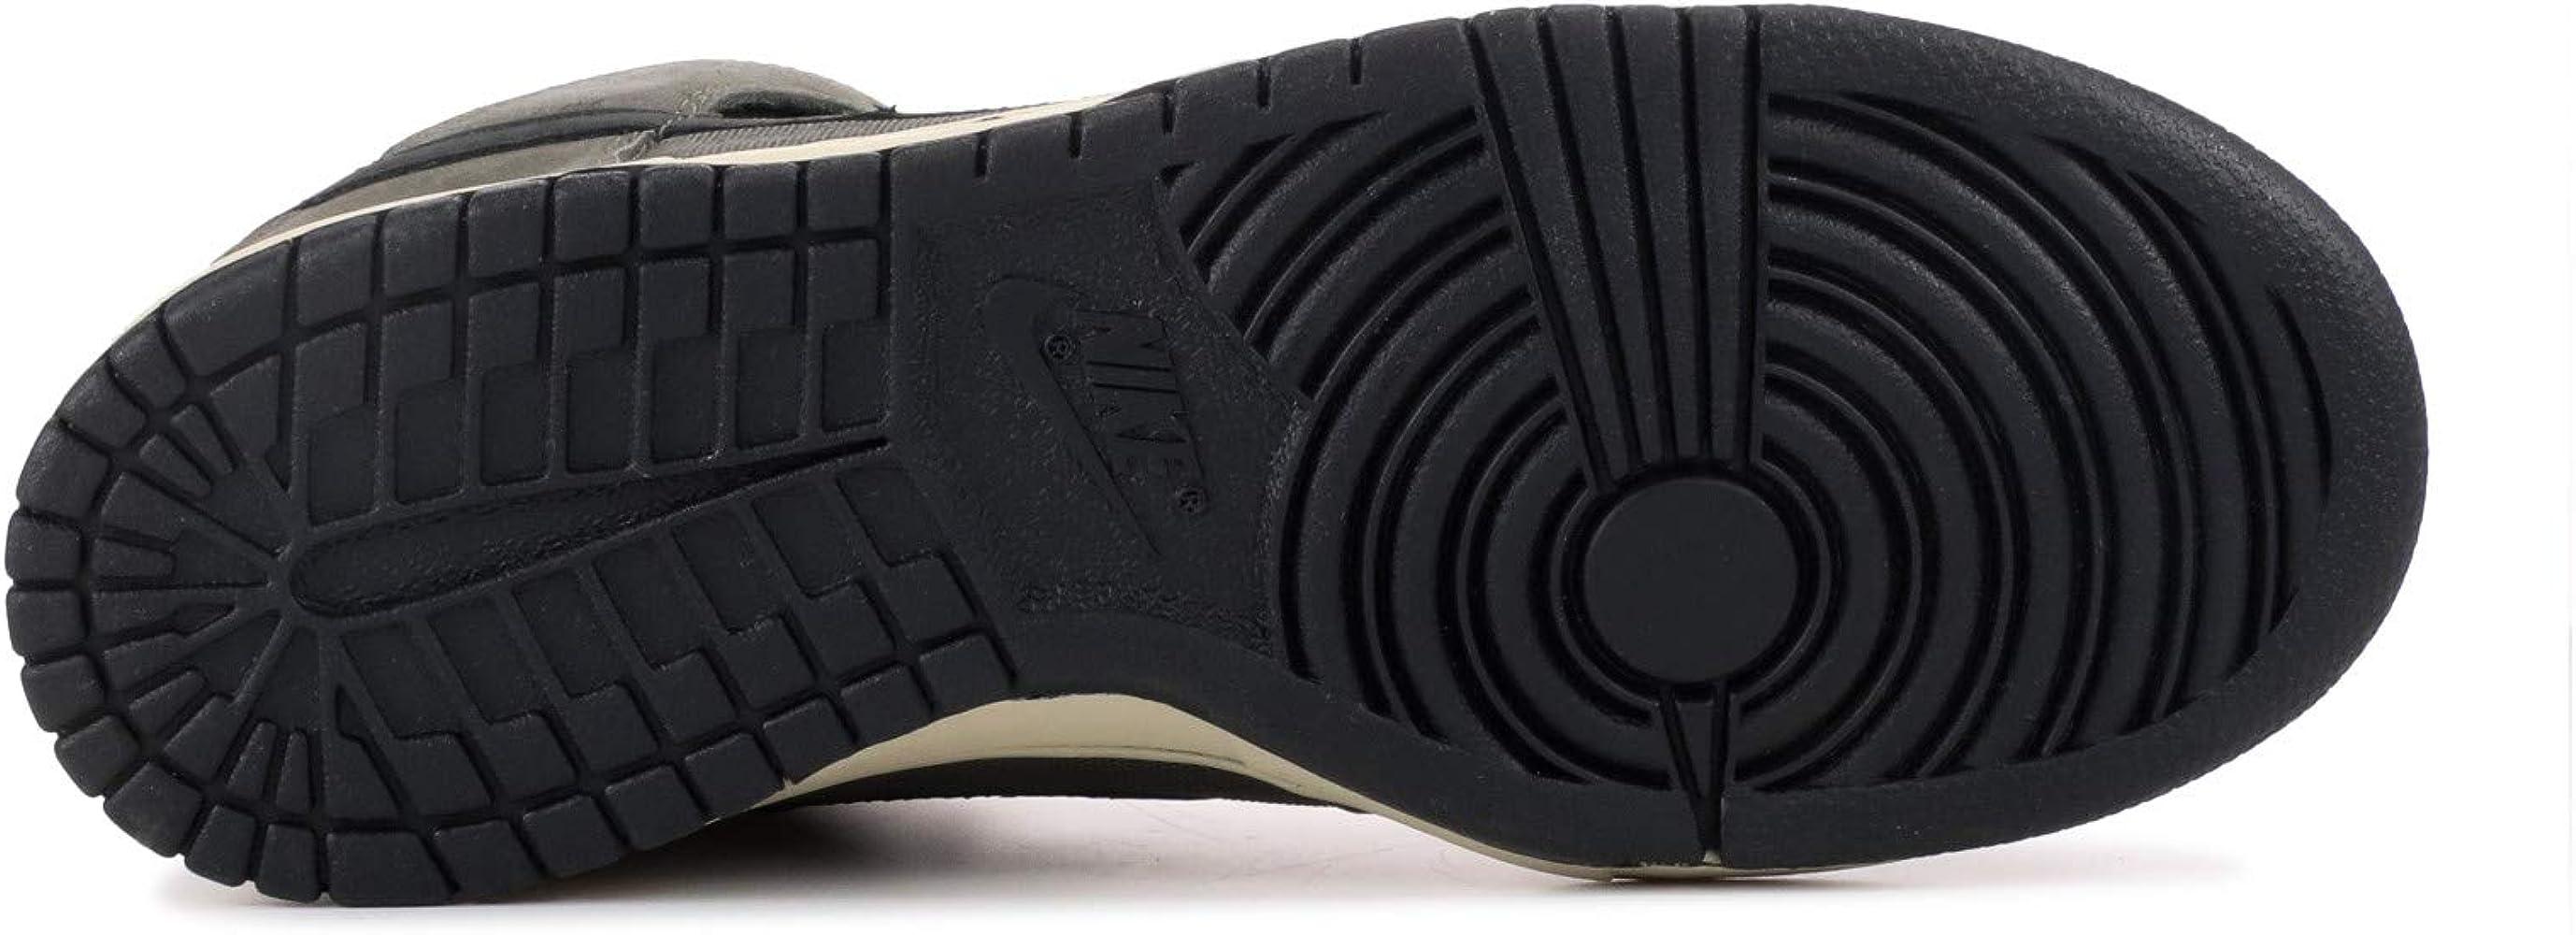 Nike 698902 001 Air MAX 2015 Zapatos de Deporte Hombre, Midnight ...